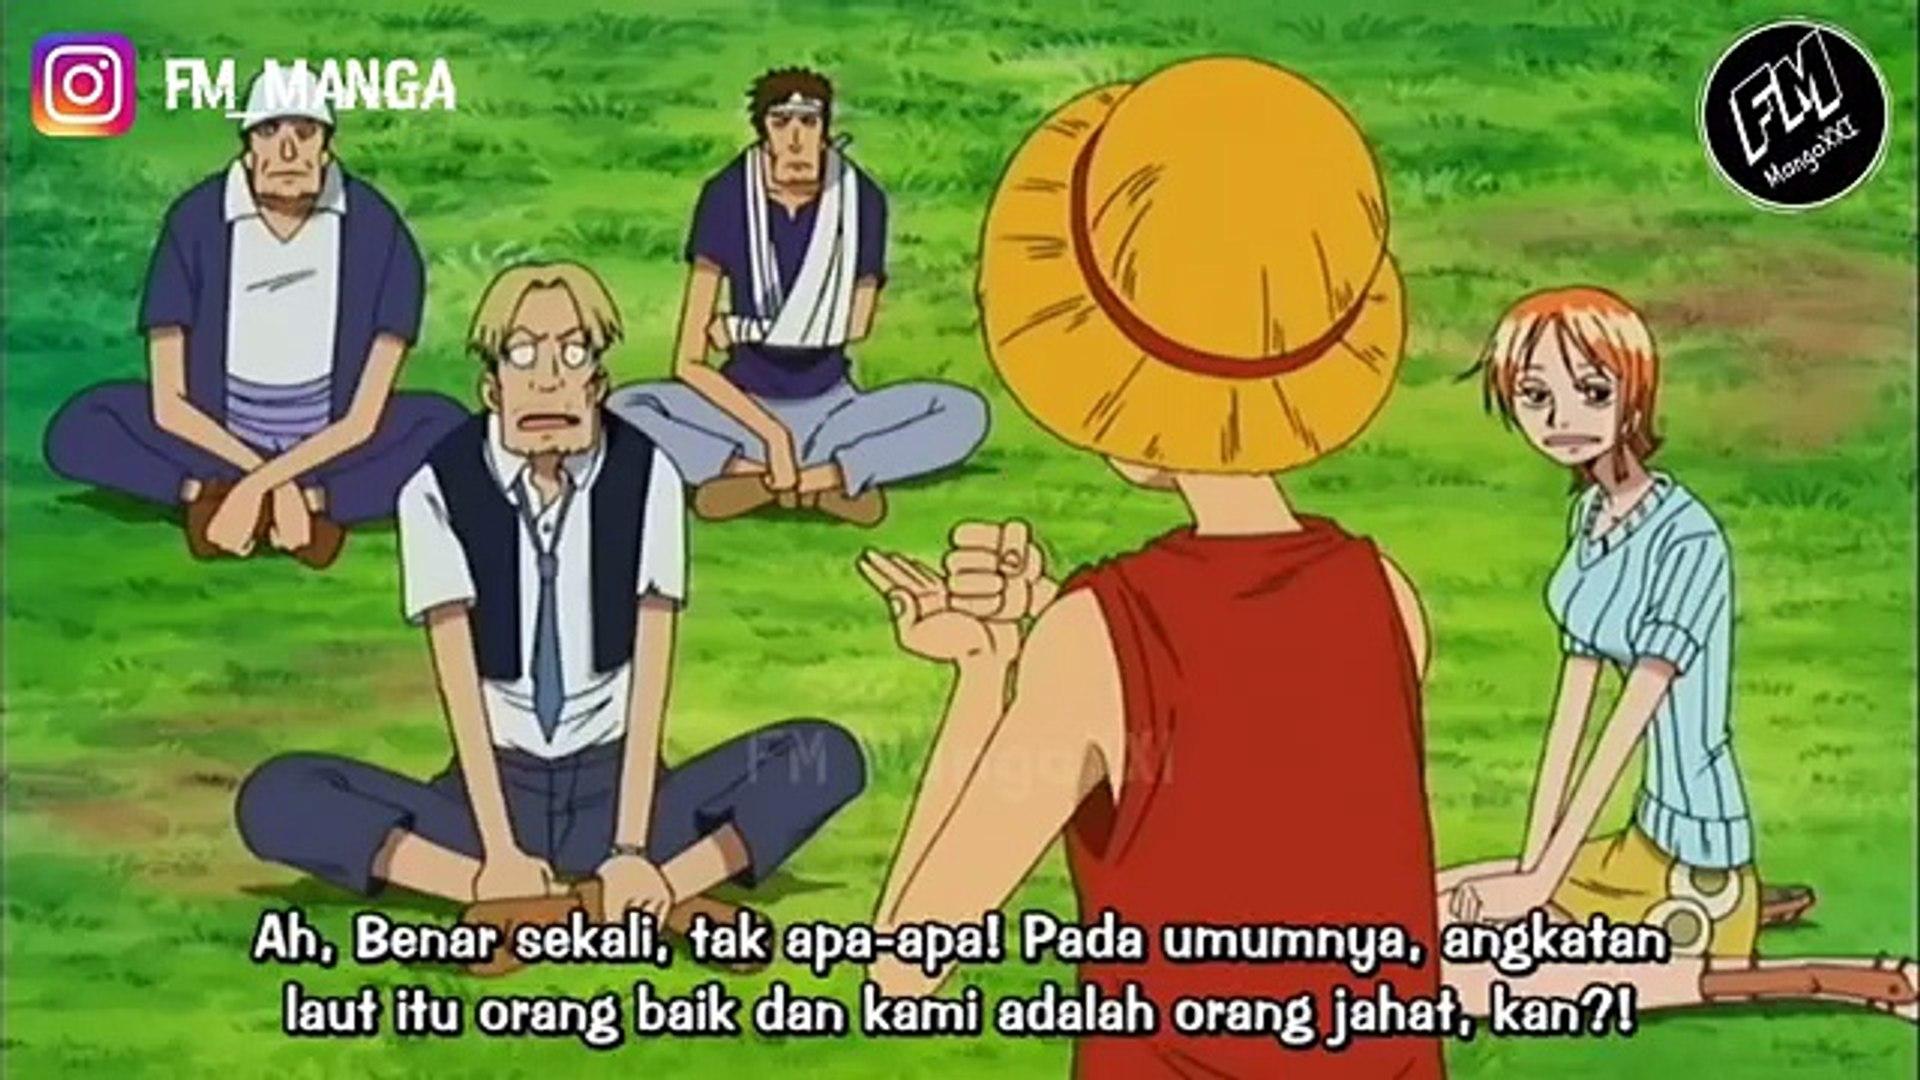 Momen Lucu One Piece Sub Indo - Funny Aokiji Moments